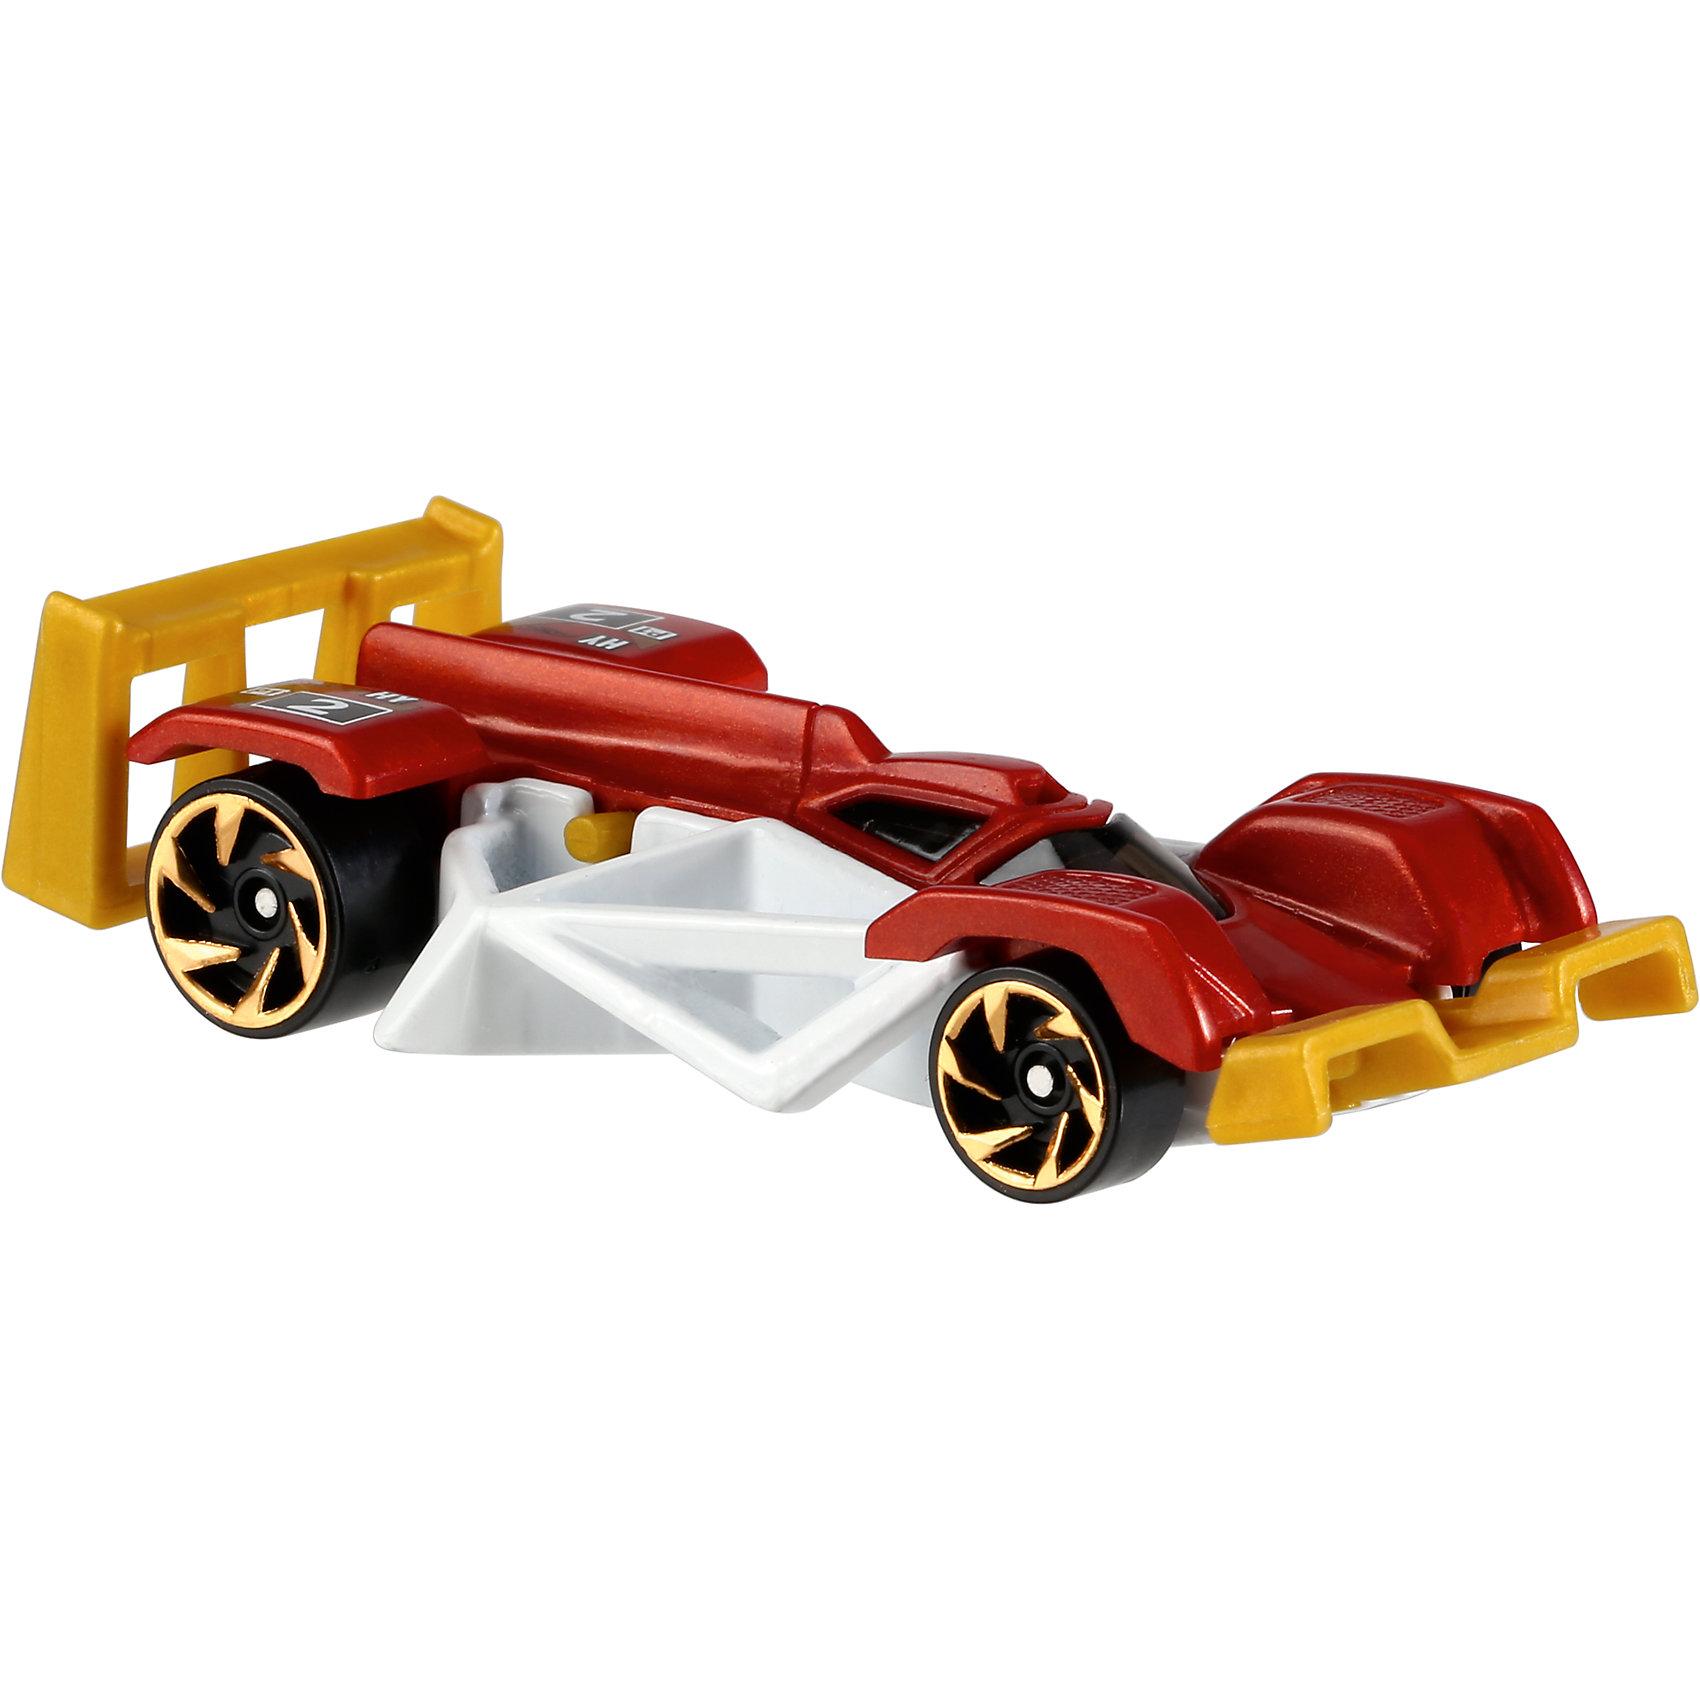 Базовая машинка Hot Wheels, Flash DriveПопулярные игрушки<br><br><br>Ширина мм: 110<br>Глубина мм: 45<br>Высота мм: 110<br>Вес г: 30<br>Возраст от месяцев: 36<br>Возраст до месяцев: 96<br>Пол: Мужской<br>Возраст: Детский<br>SKU: 7111082